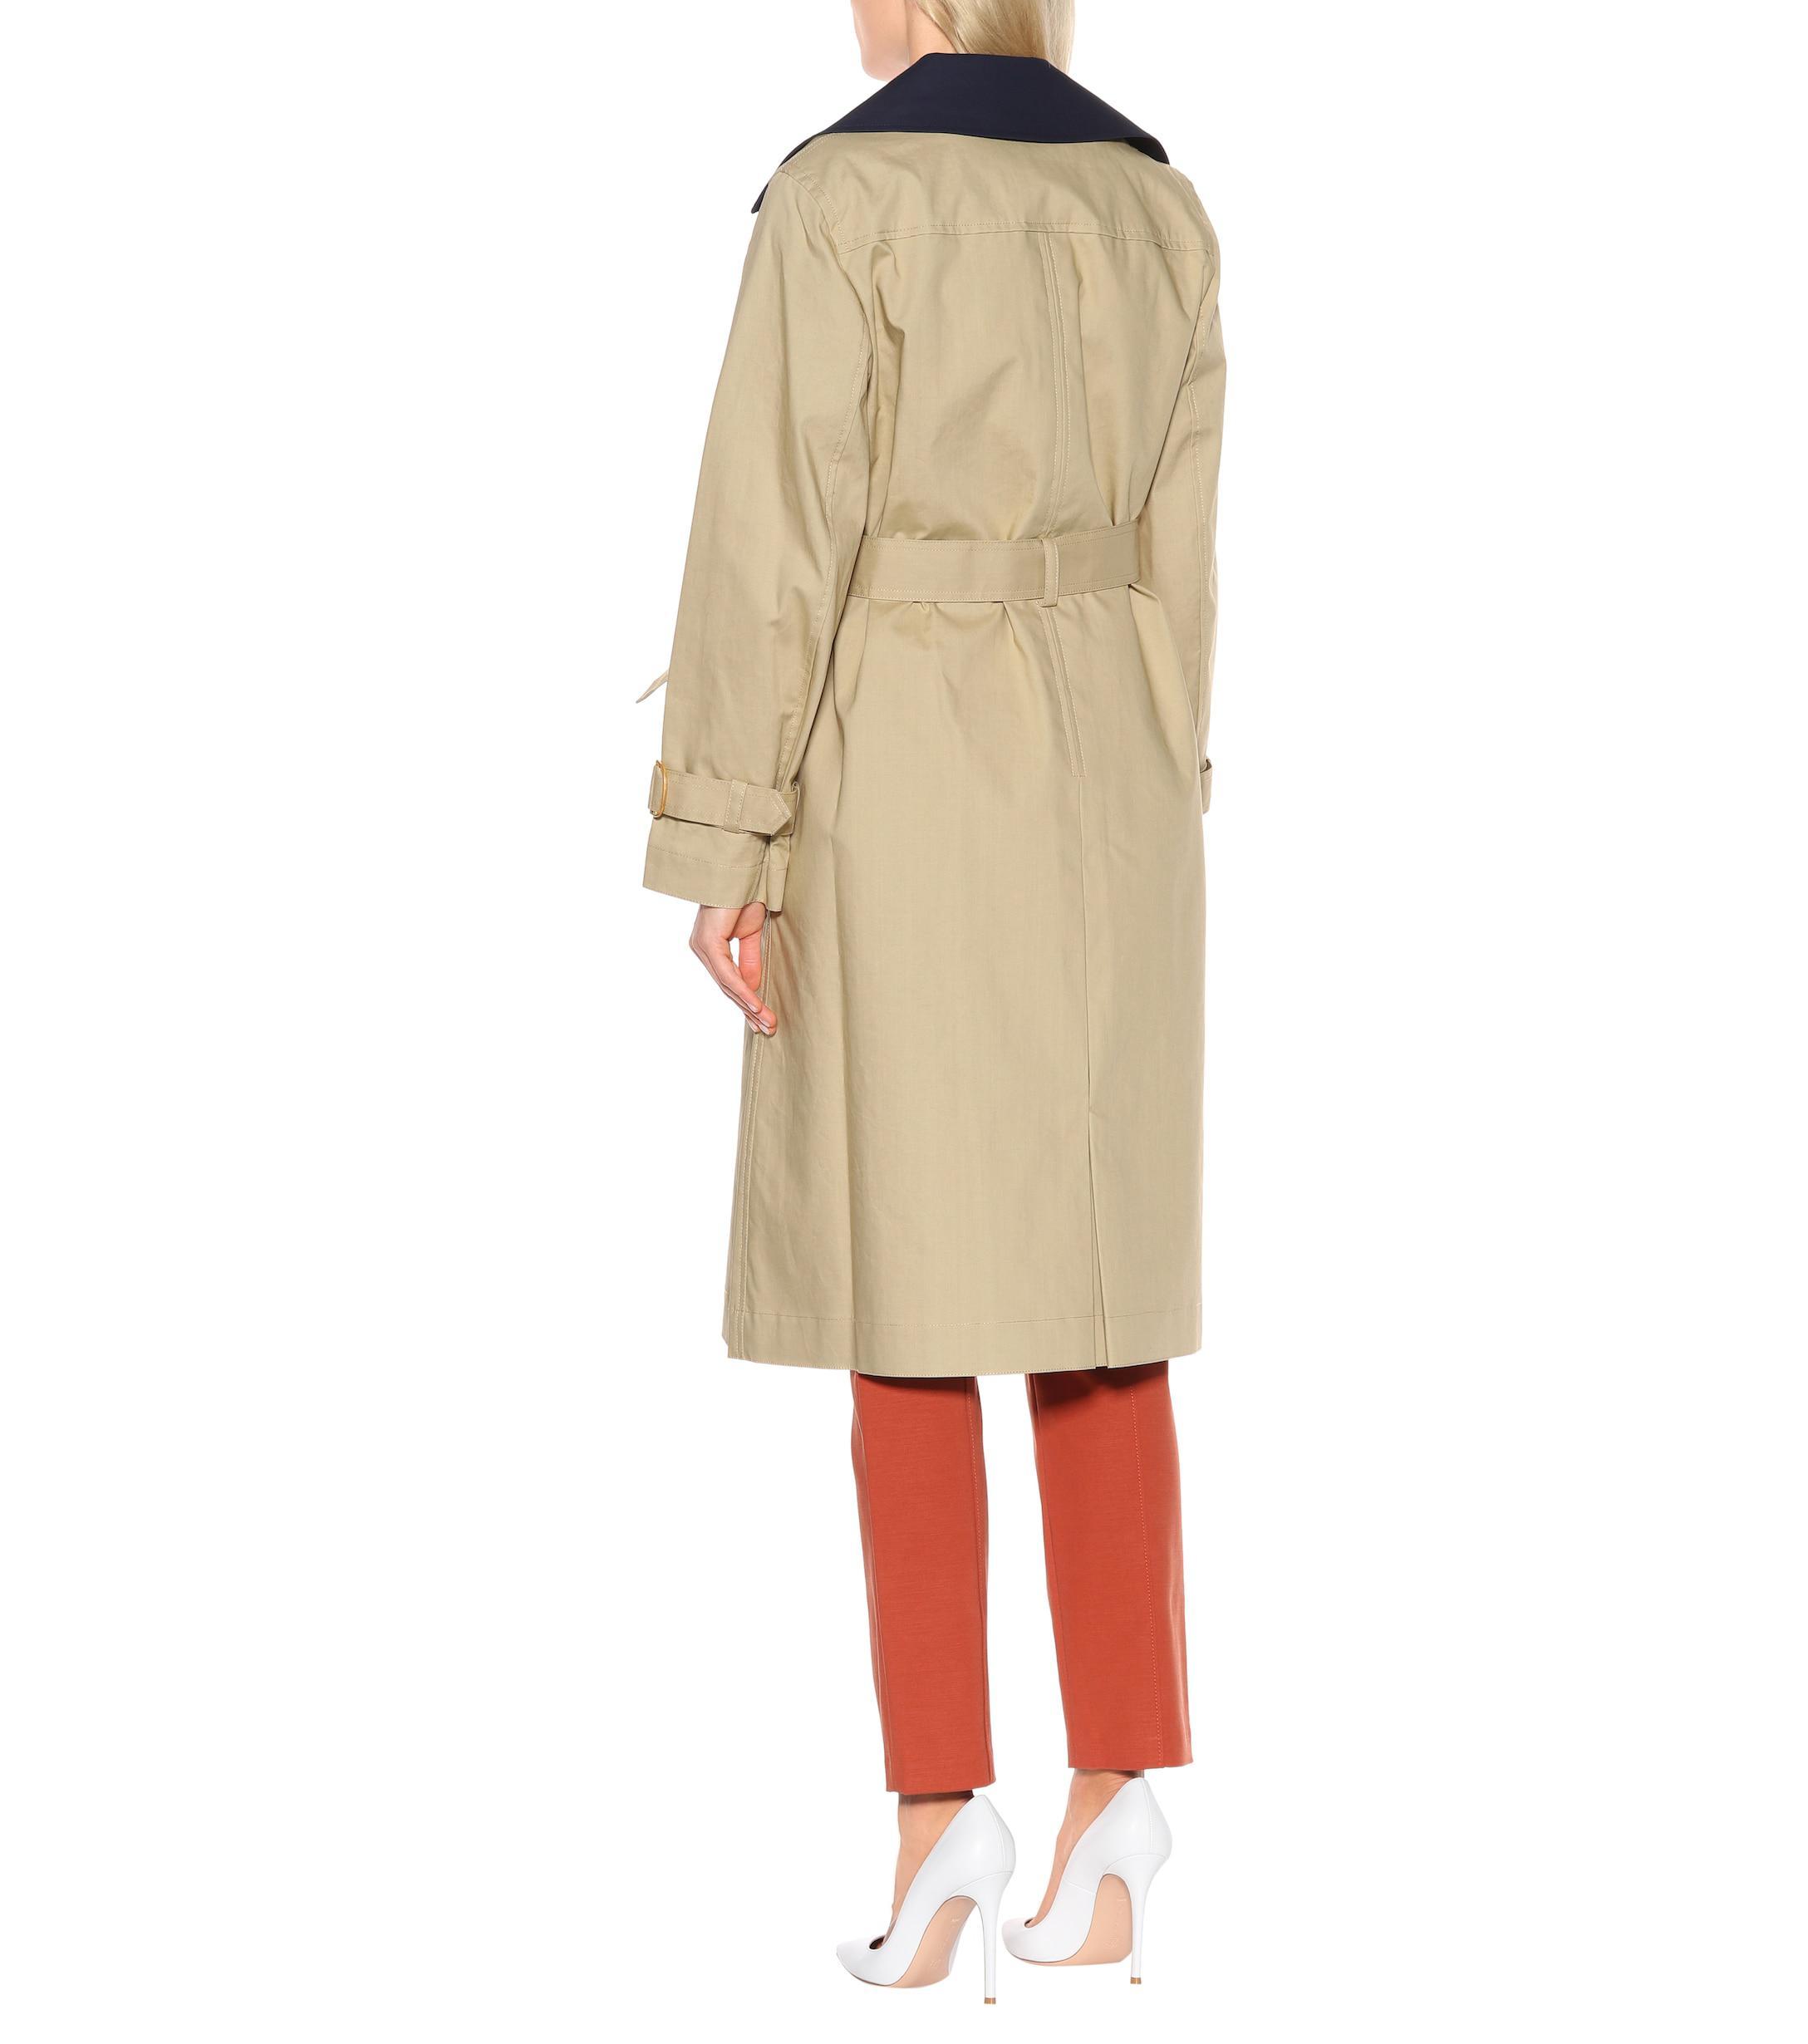 1ba427bd7d5d Tory Burch - Multicolor Ashby Cotton Trench Coat - Lyst. View fullscreen